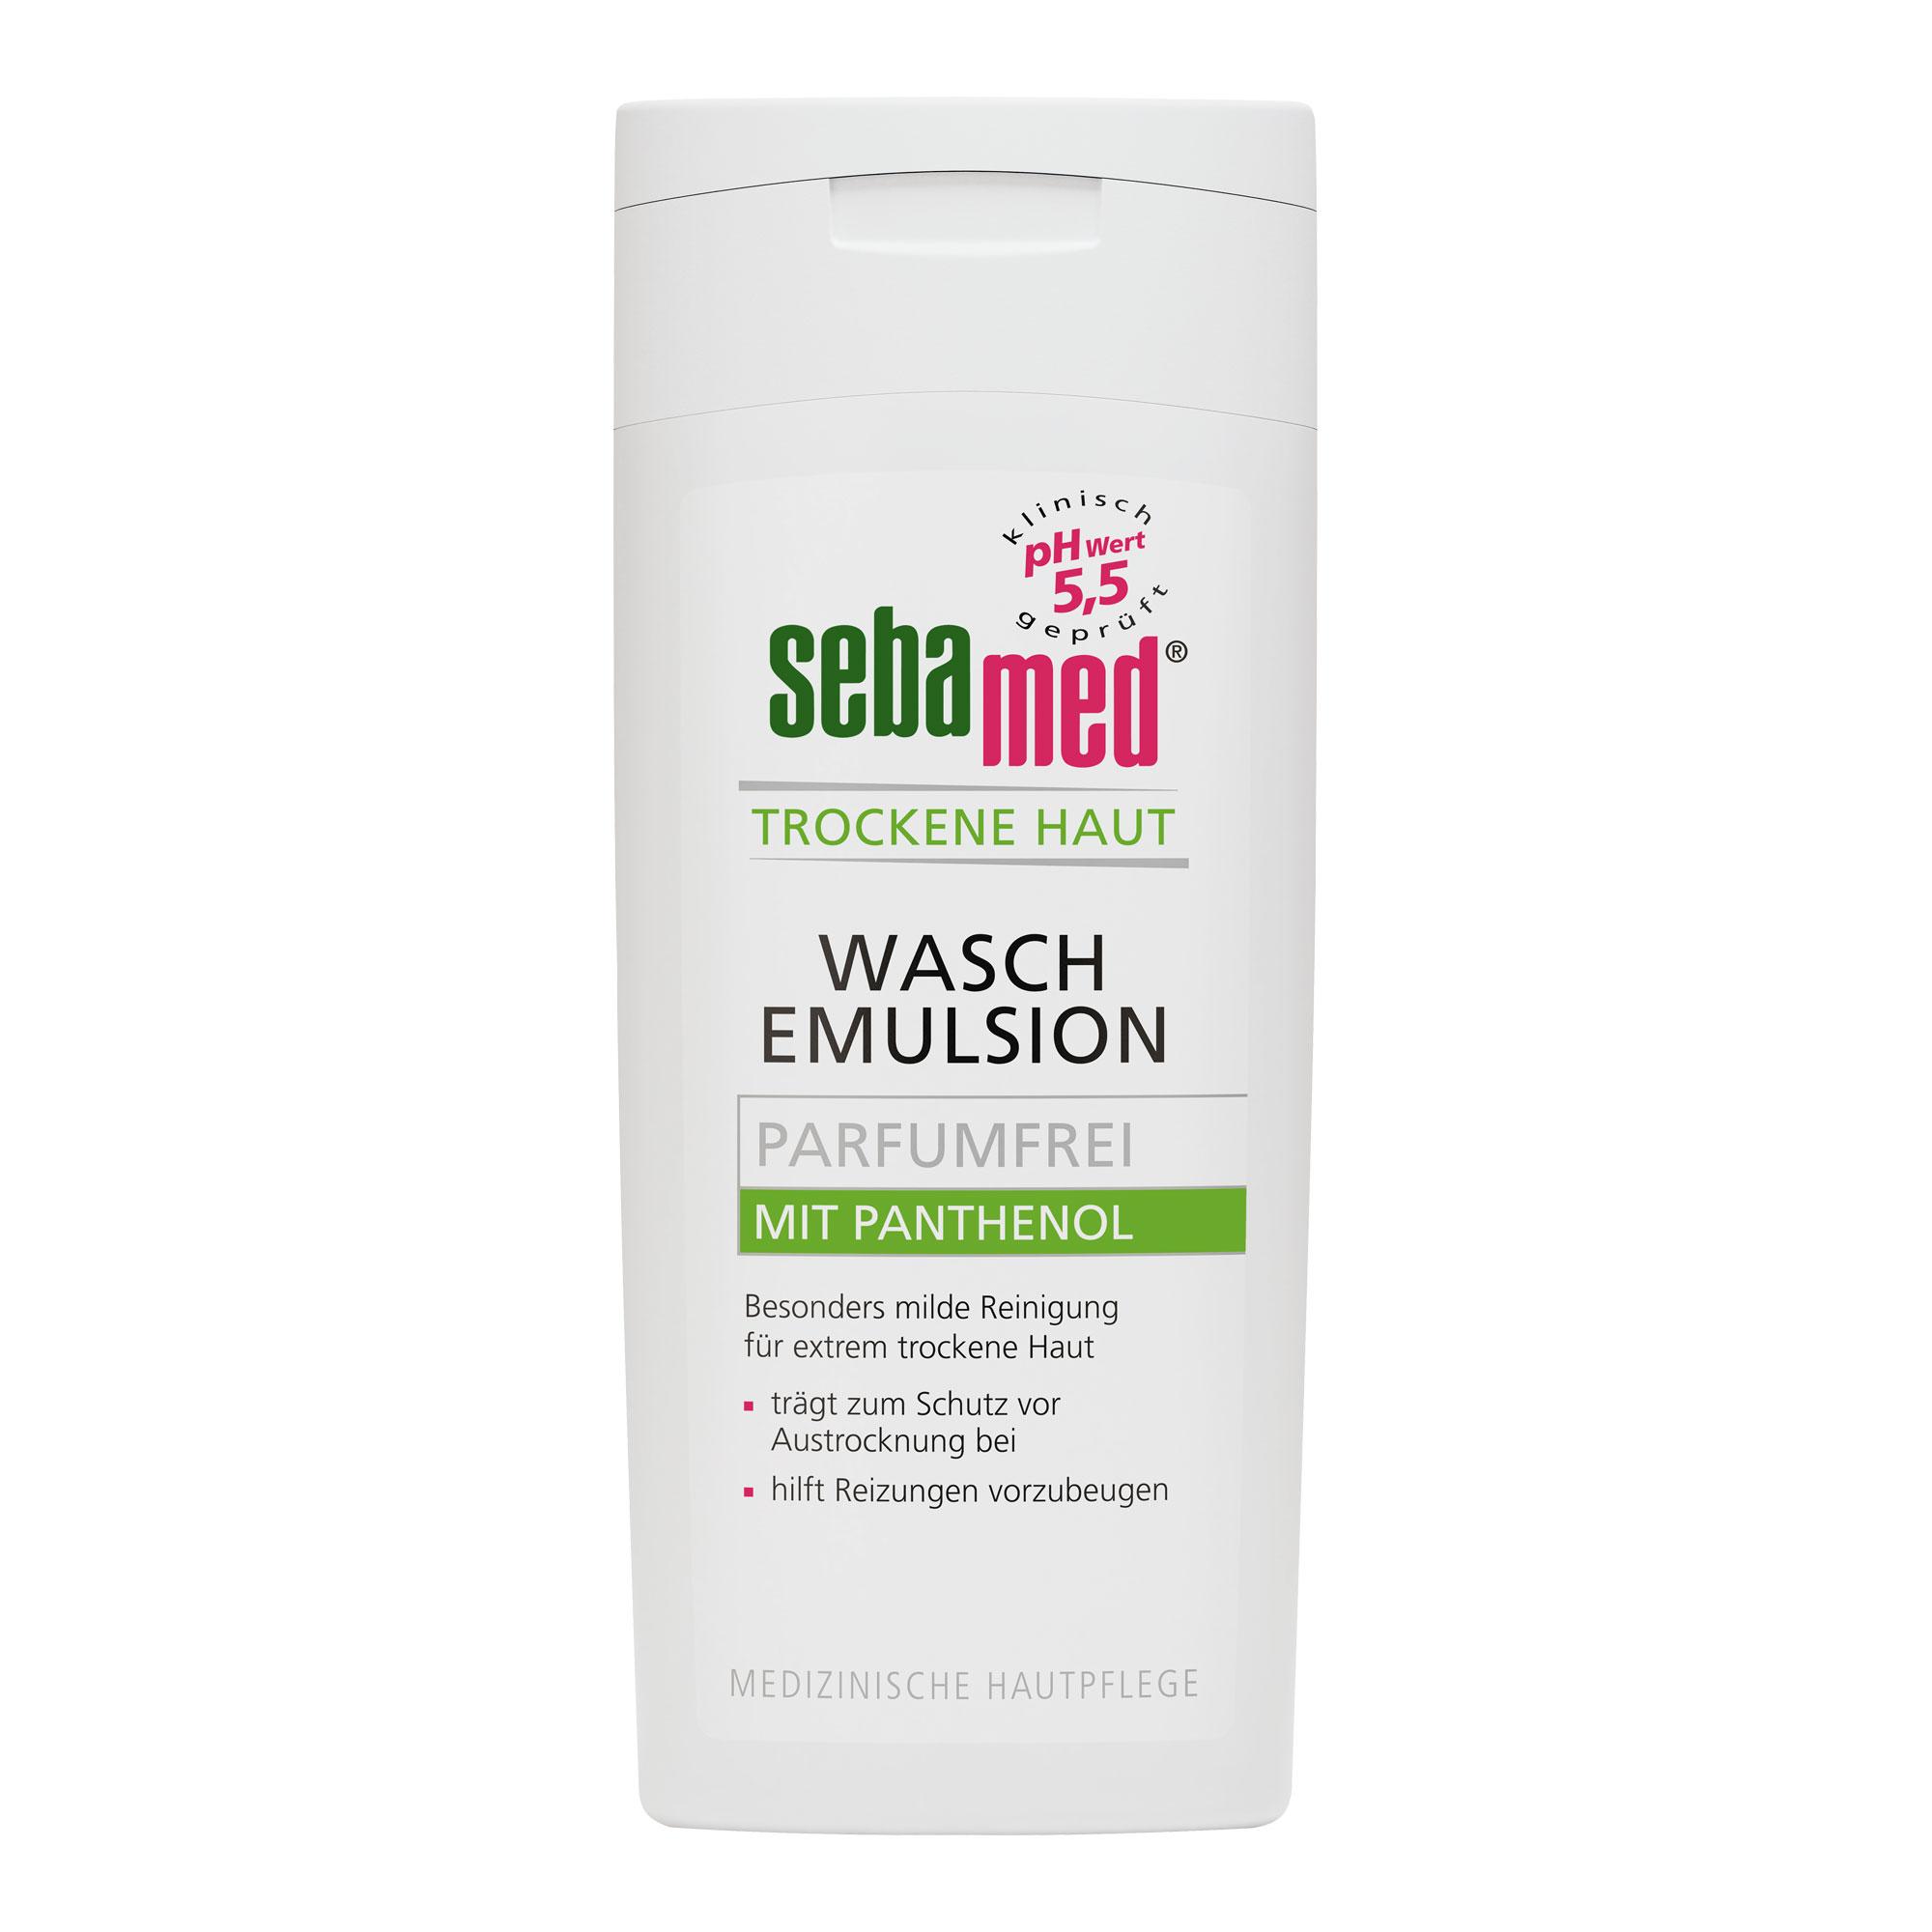 Sebamed Trockene Haut Waschemulsion parfümfrei